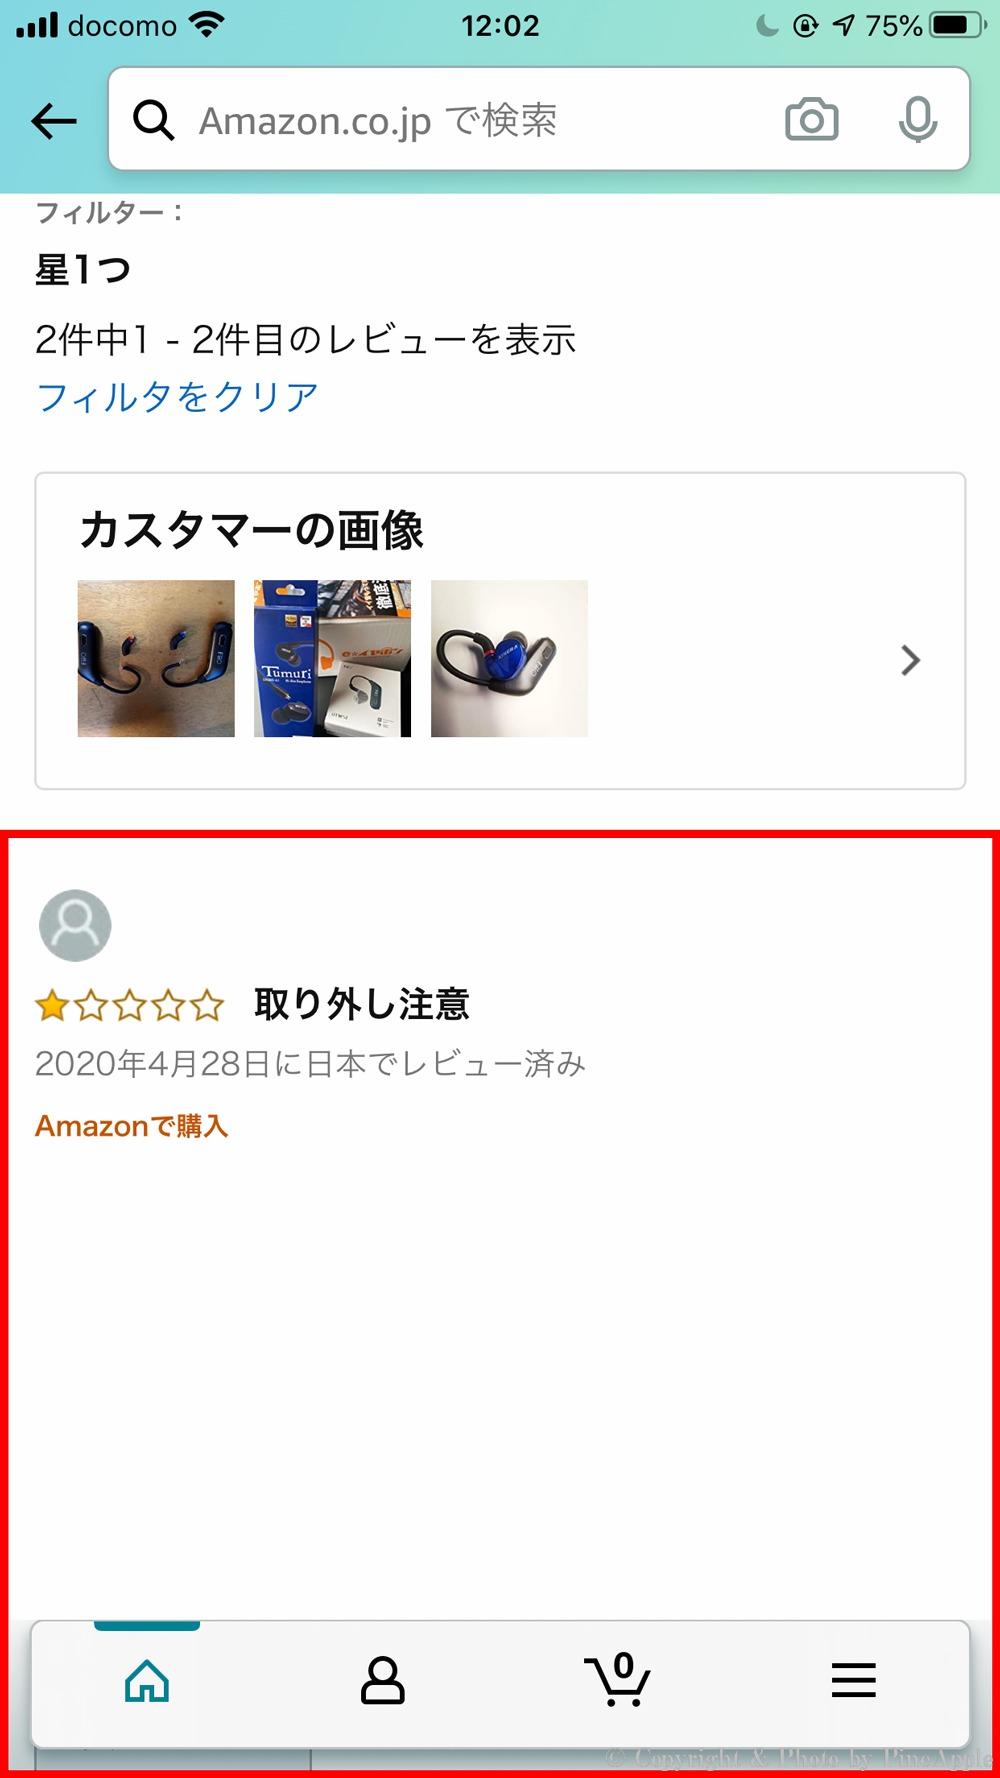 Amazon ショッピングアプリ:「星 1 つ」の評価のみのレビューが表示